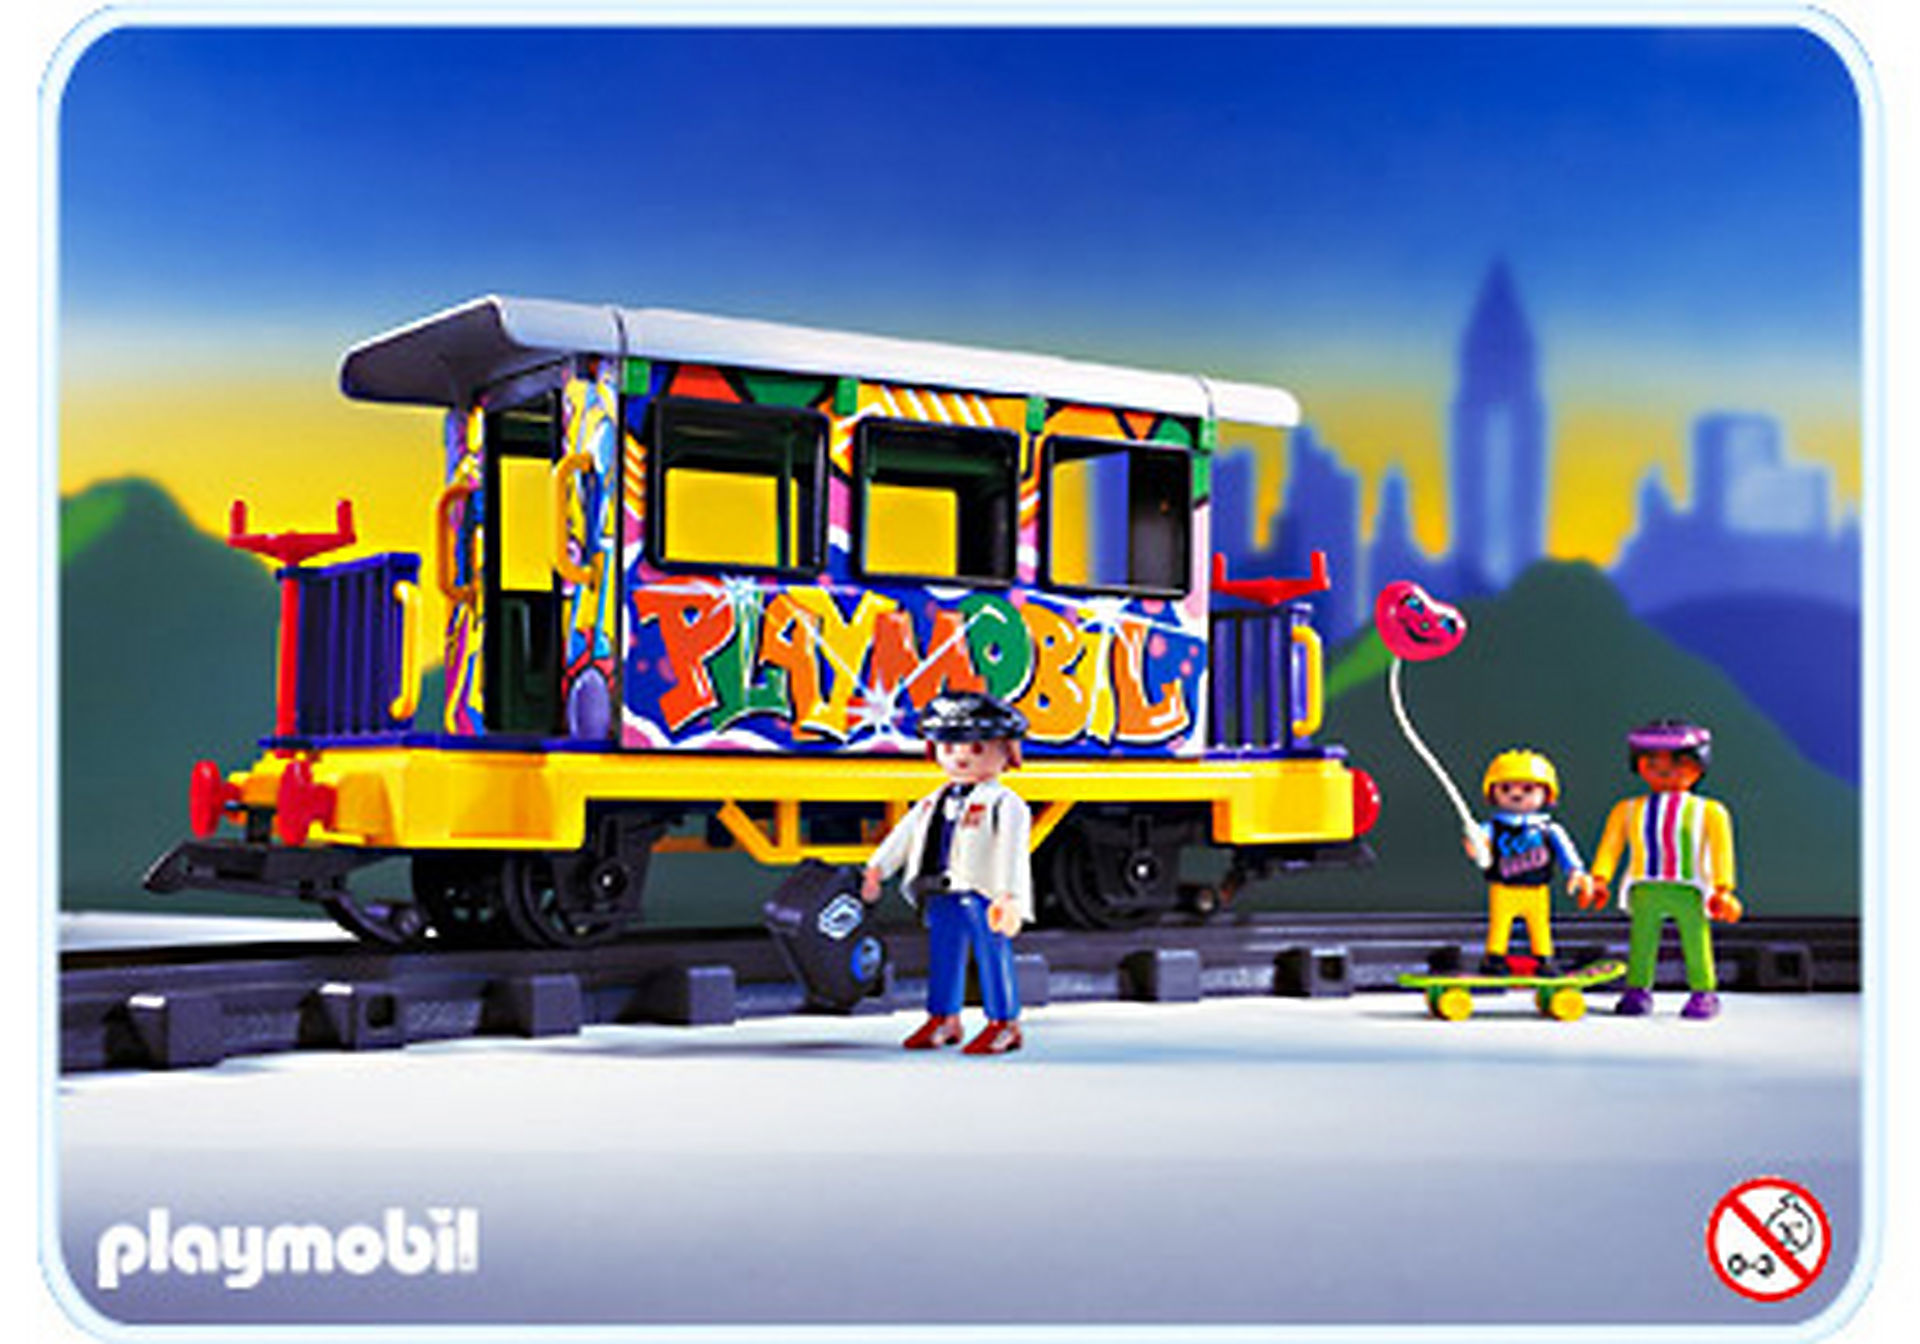 http://media.playmobil.com/i/playmobil/4118-A_product_detail/Graffitiwagen